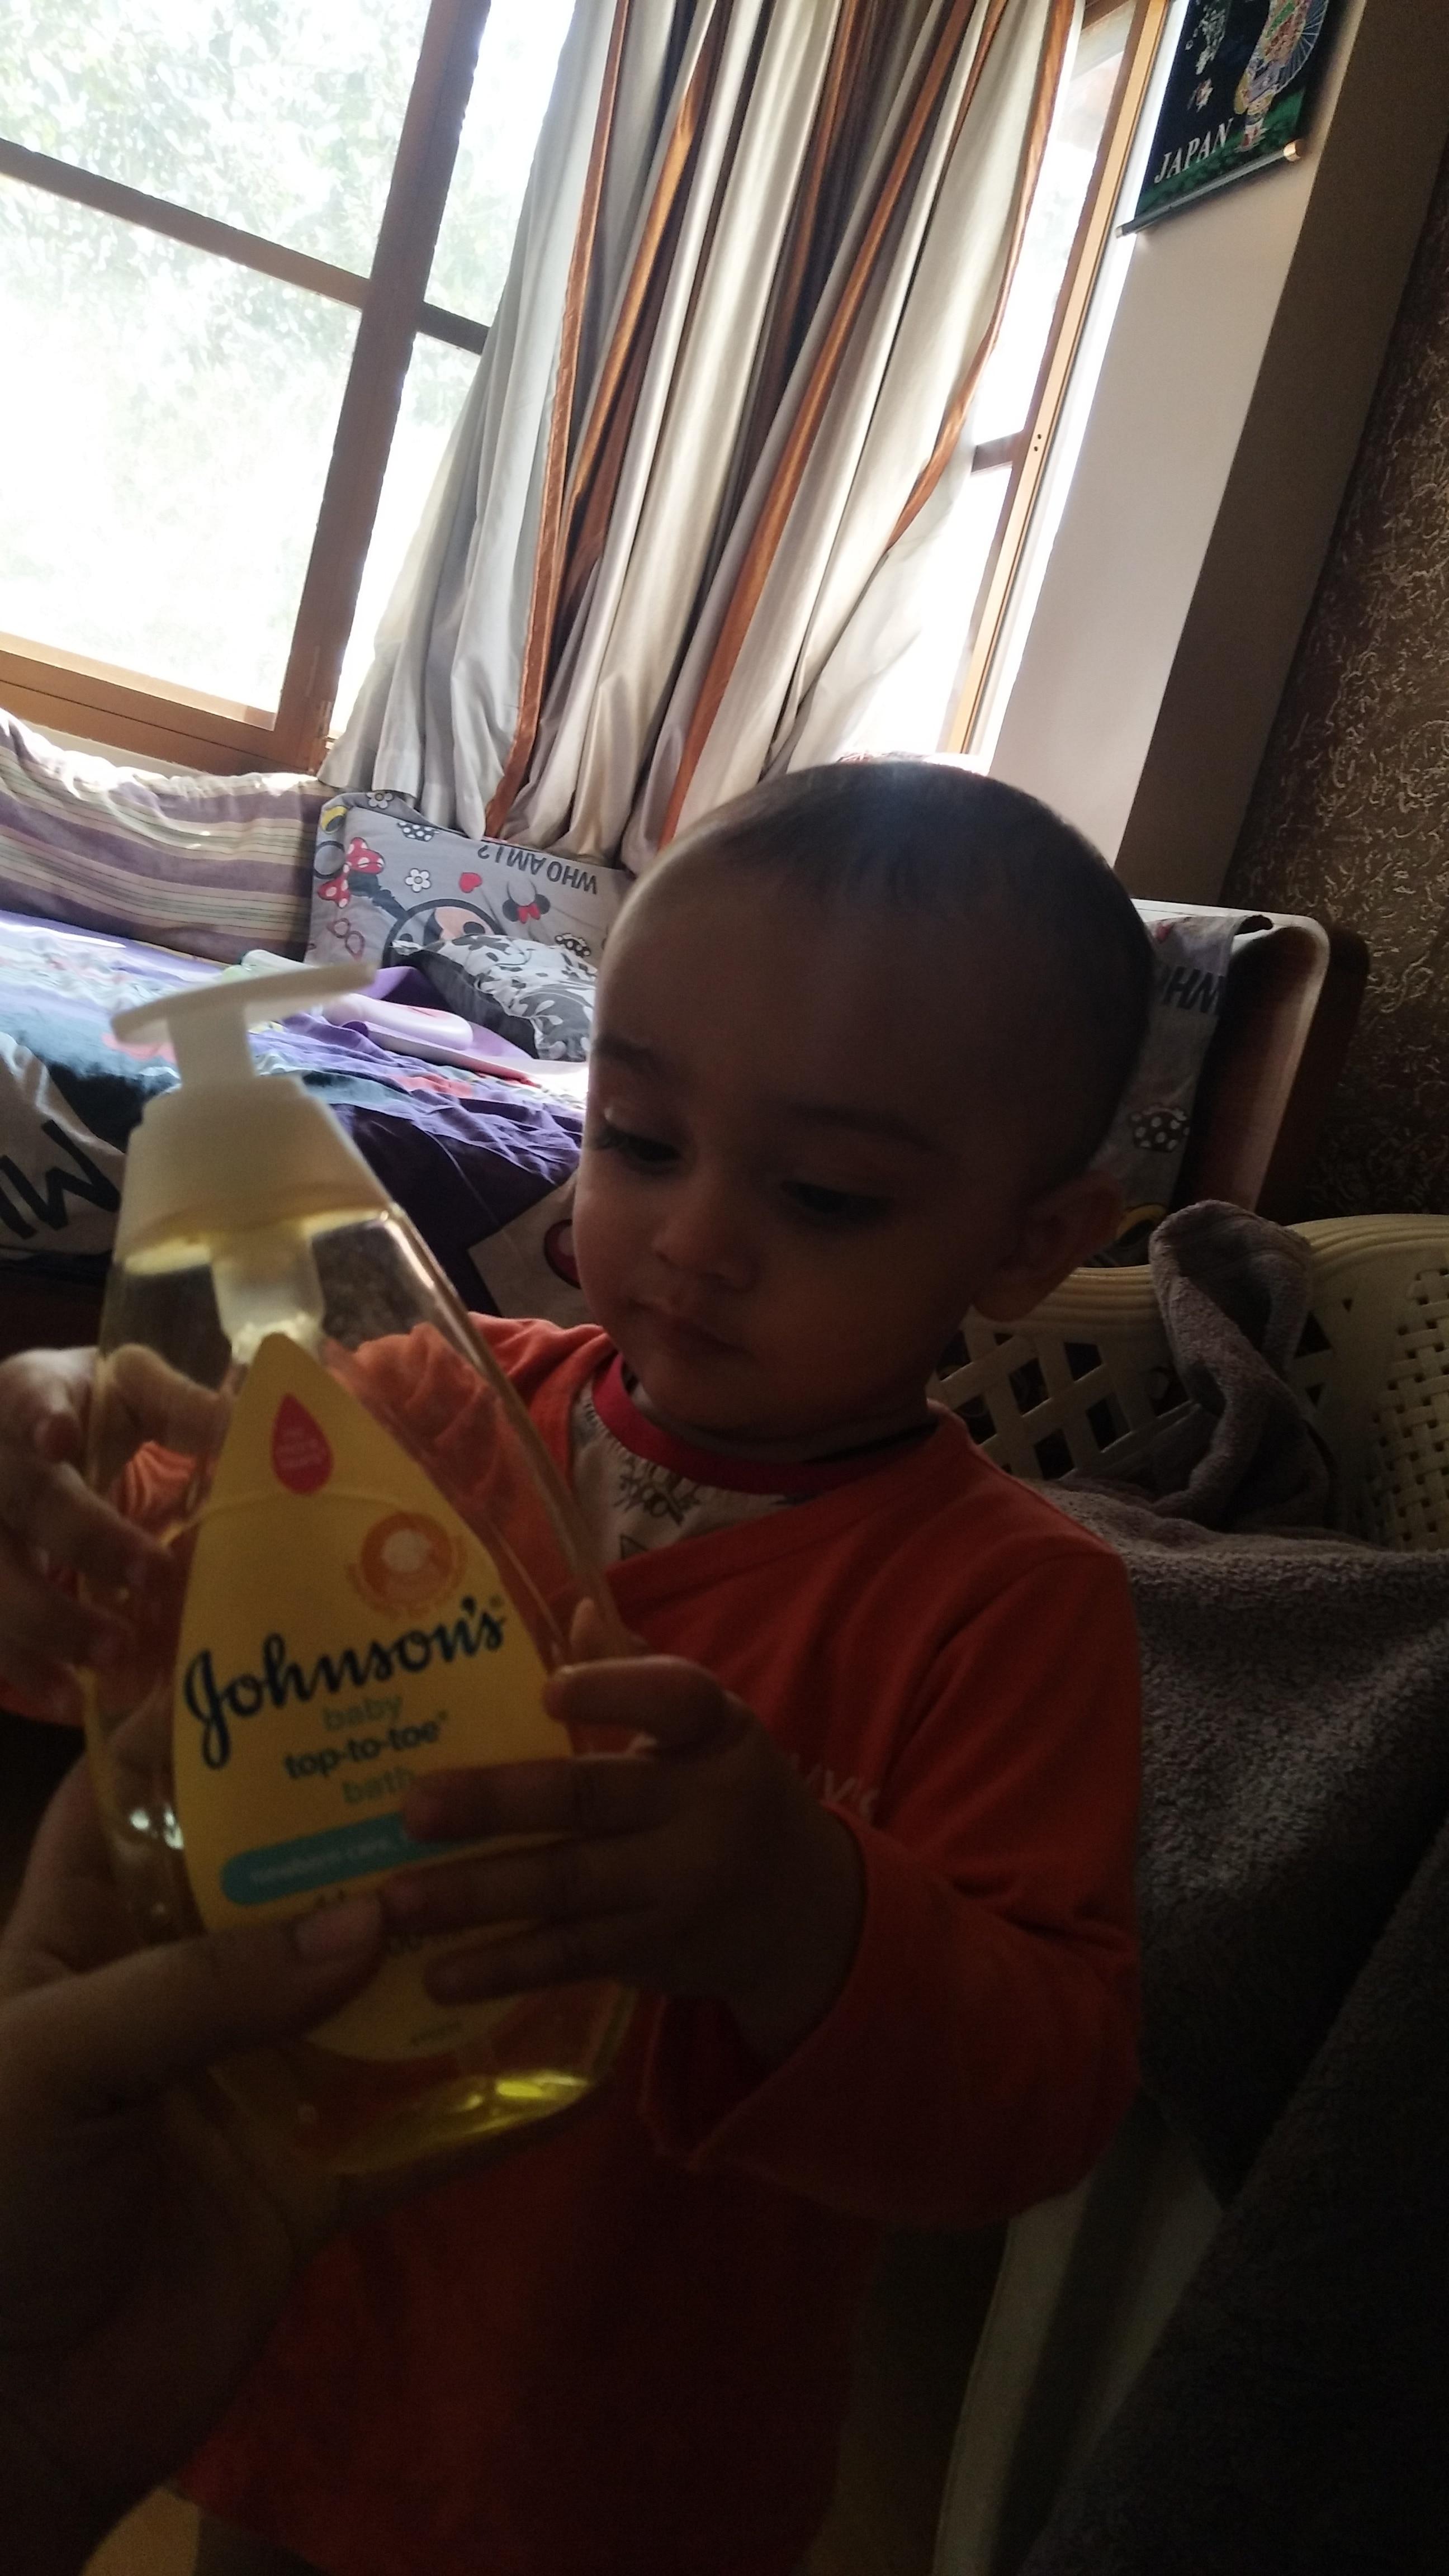 Johnson's Baby Top to Toe Bath wash-Johnsons and johnsons-By presha13